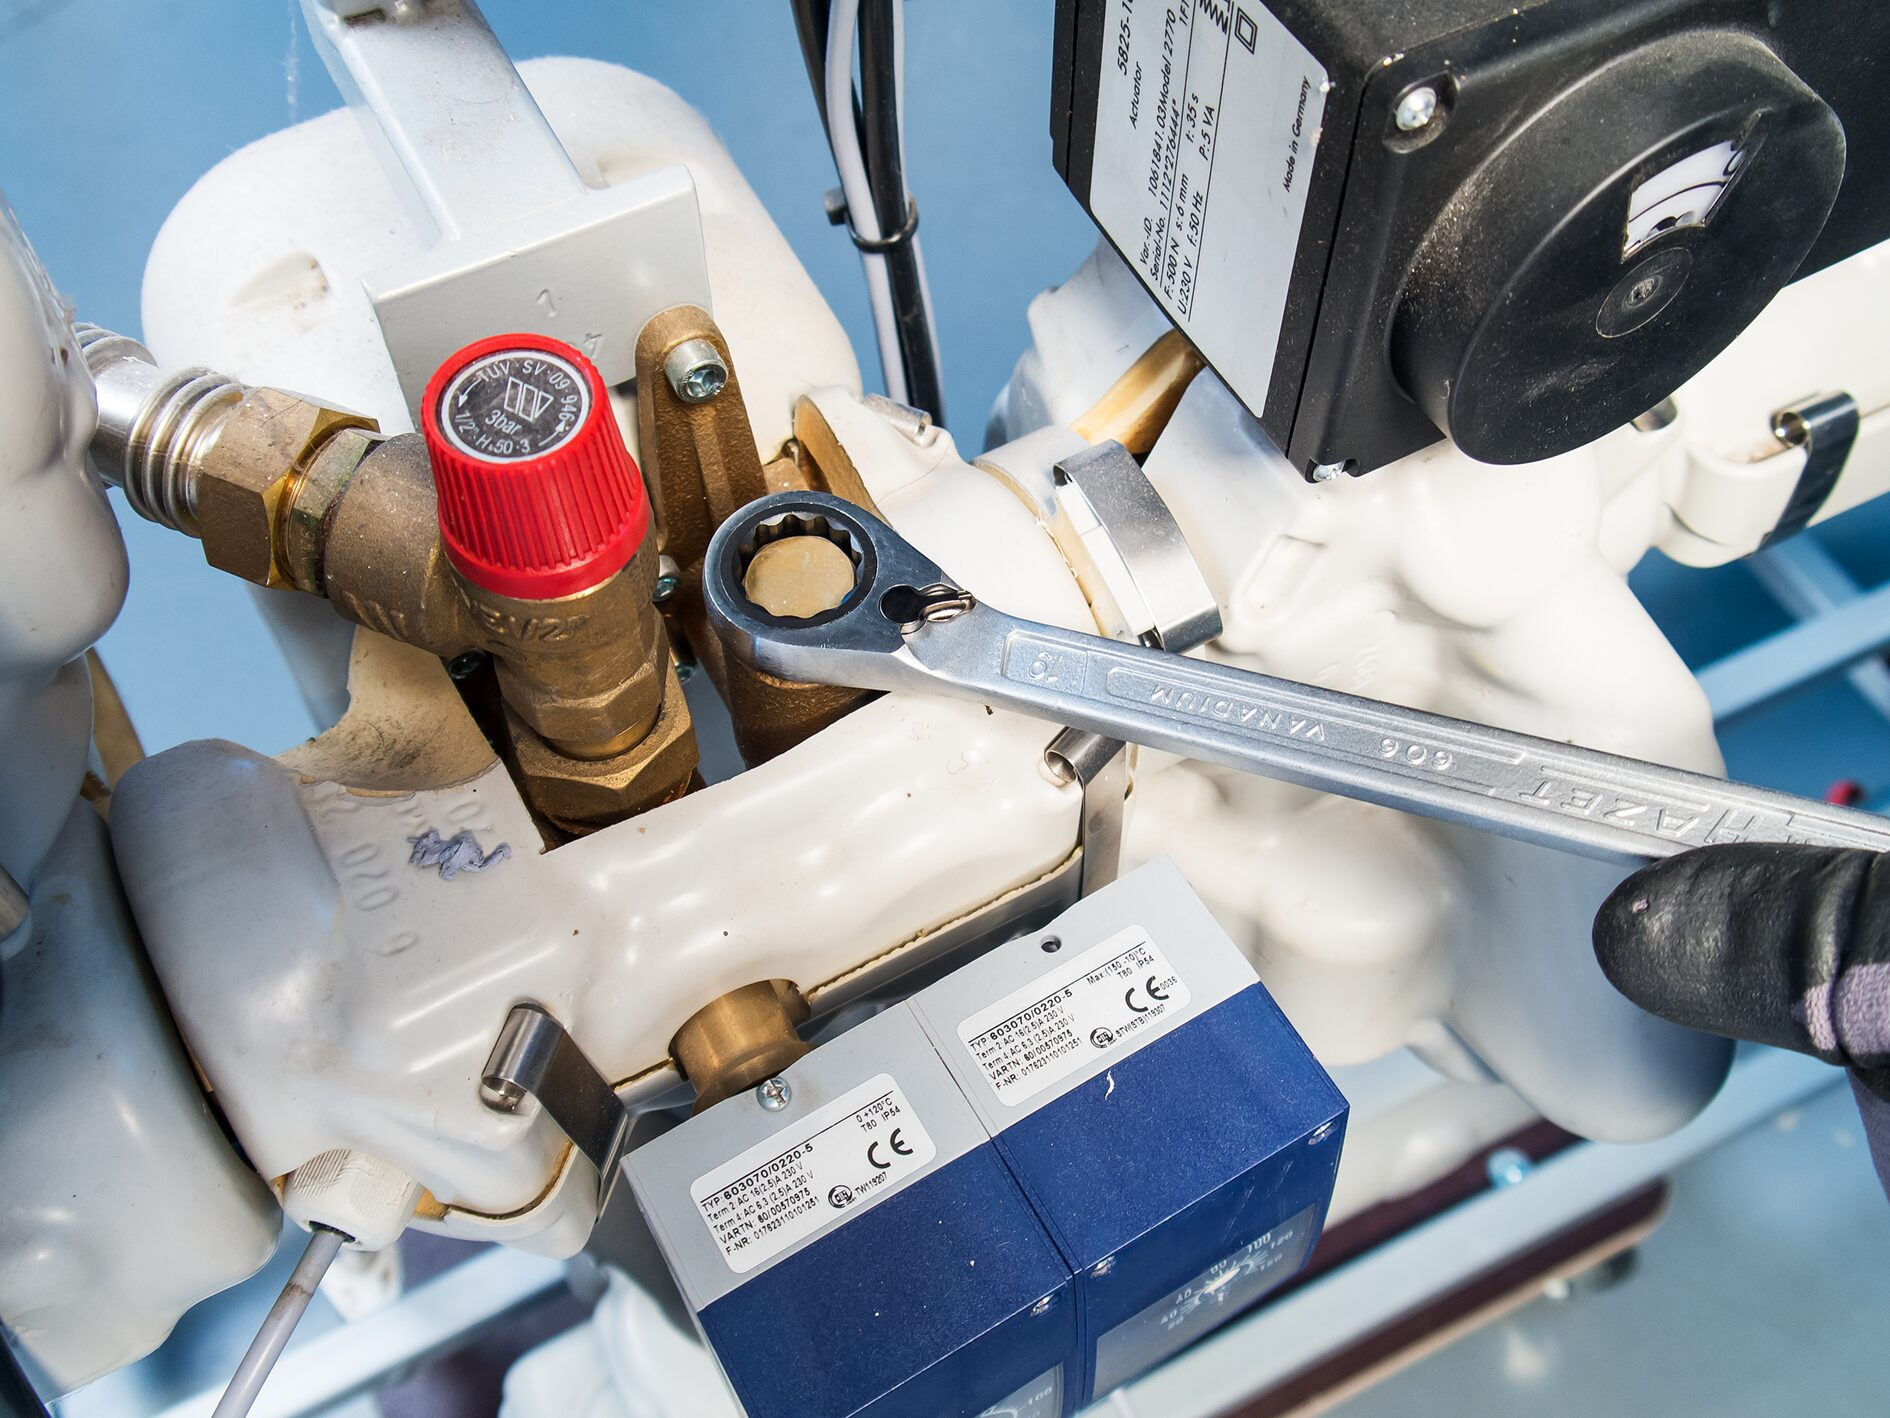 HAZET Knarren Ring-Maulschlüssel 606-30 ∙ Außen-Doppel-Sechskant-Tractionsprofil ∙ 30 mm